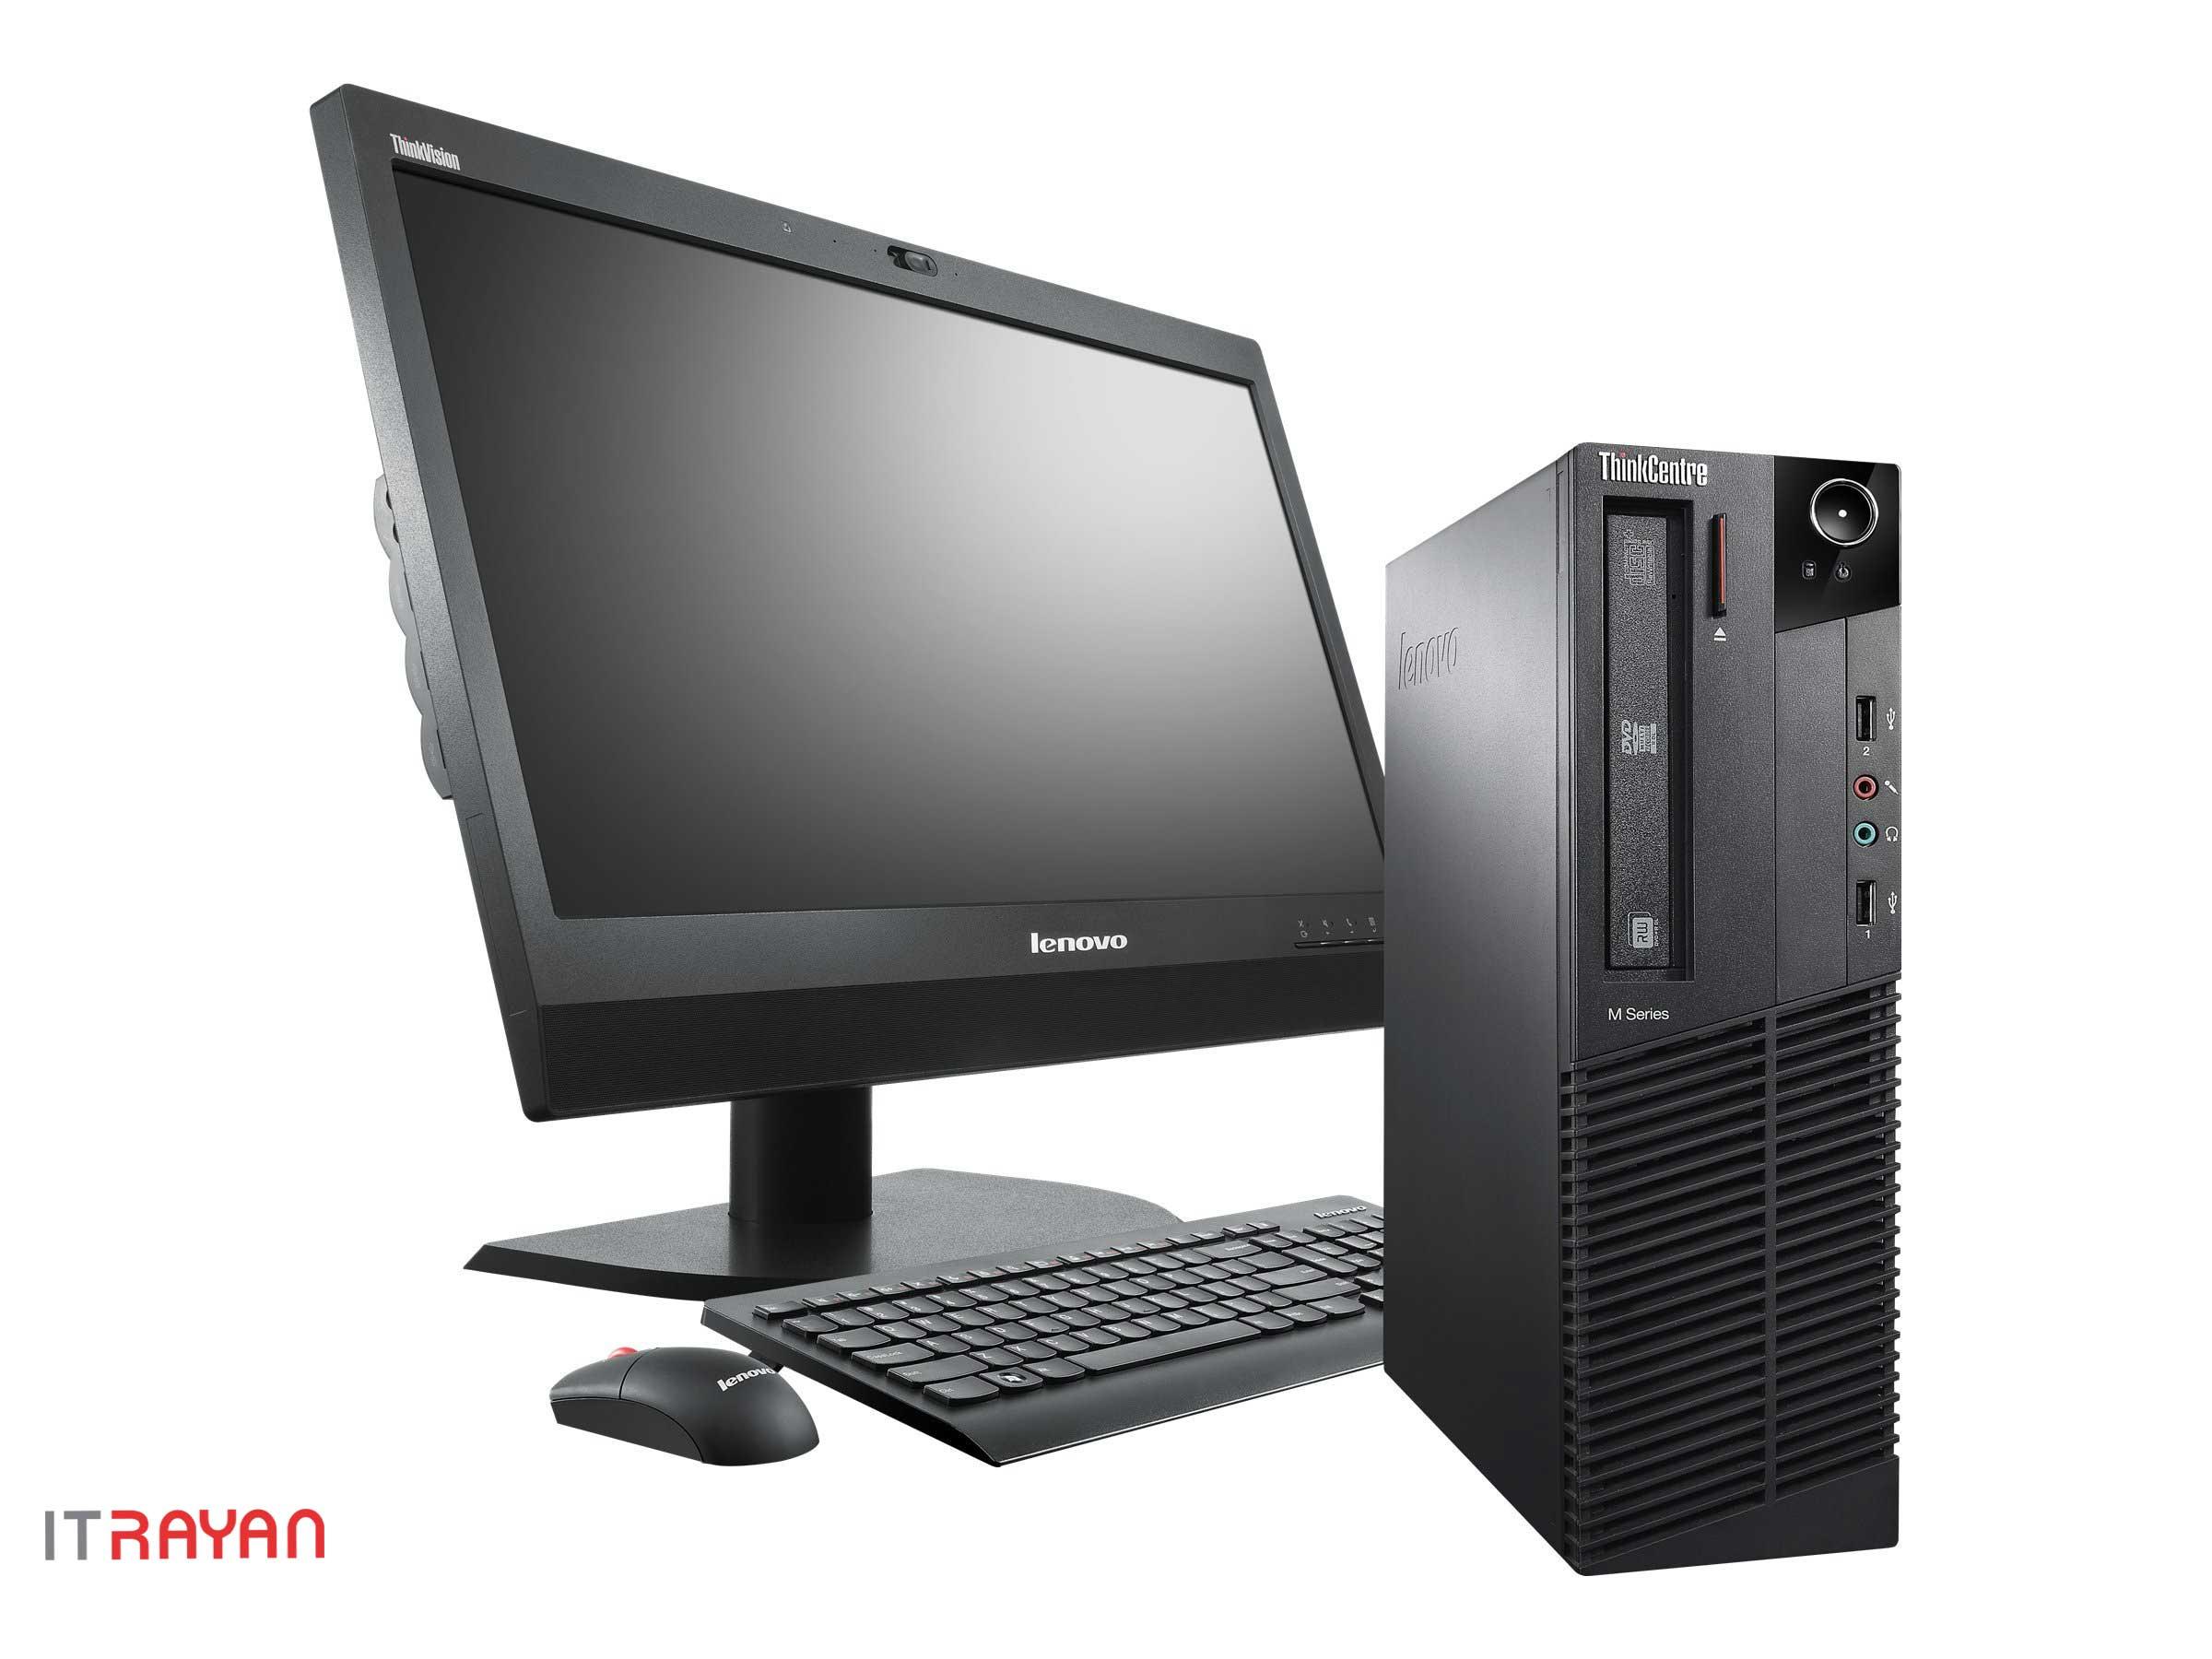 کیس استوک لنوو Lenovo ThinkCentre M92p